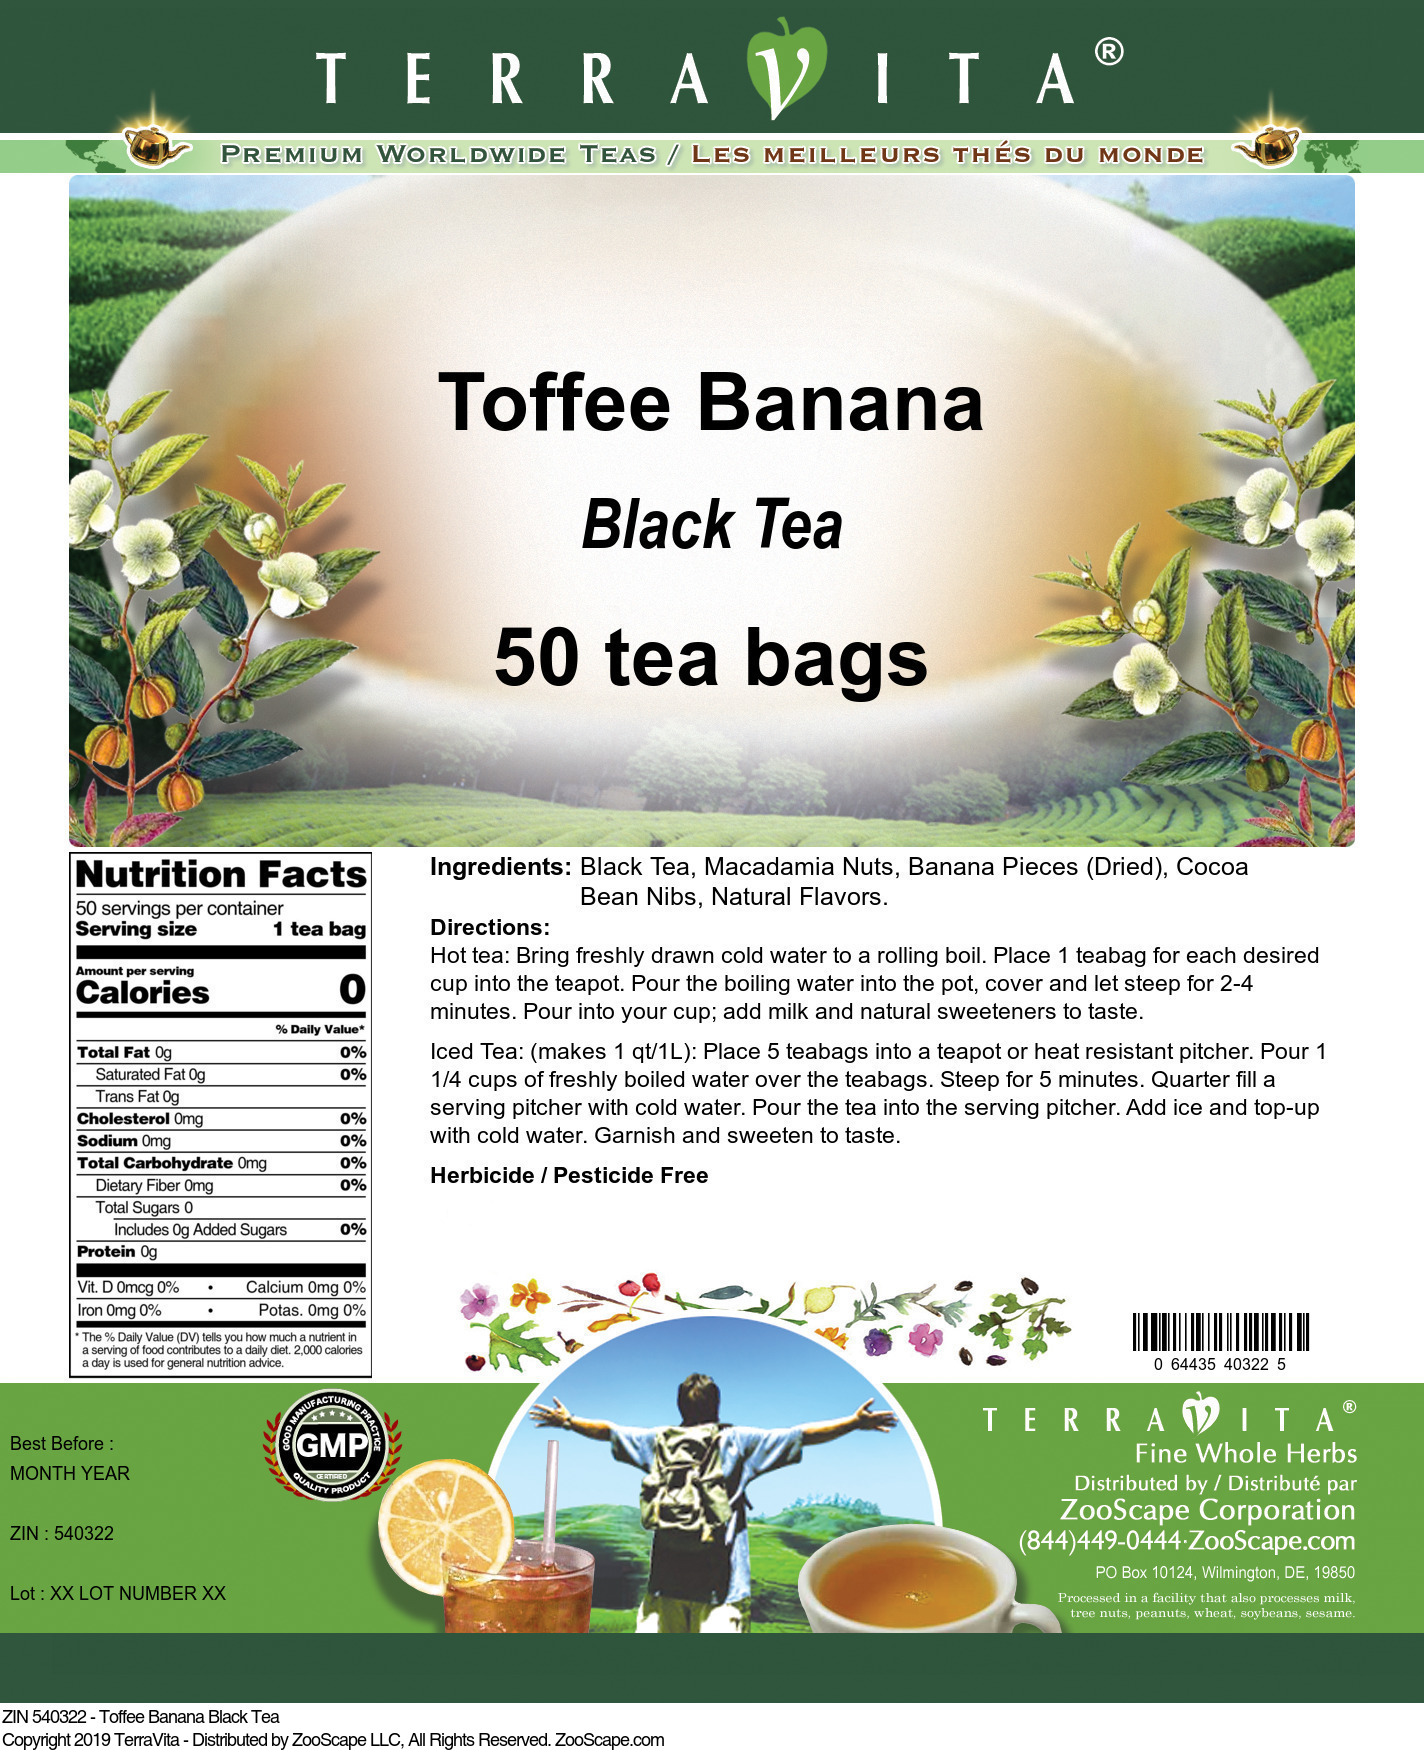 Toffee Banana Black Tea